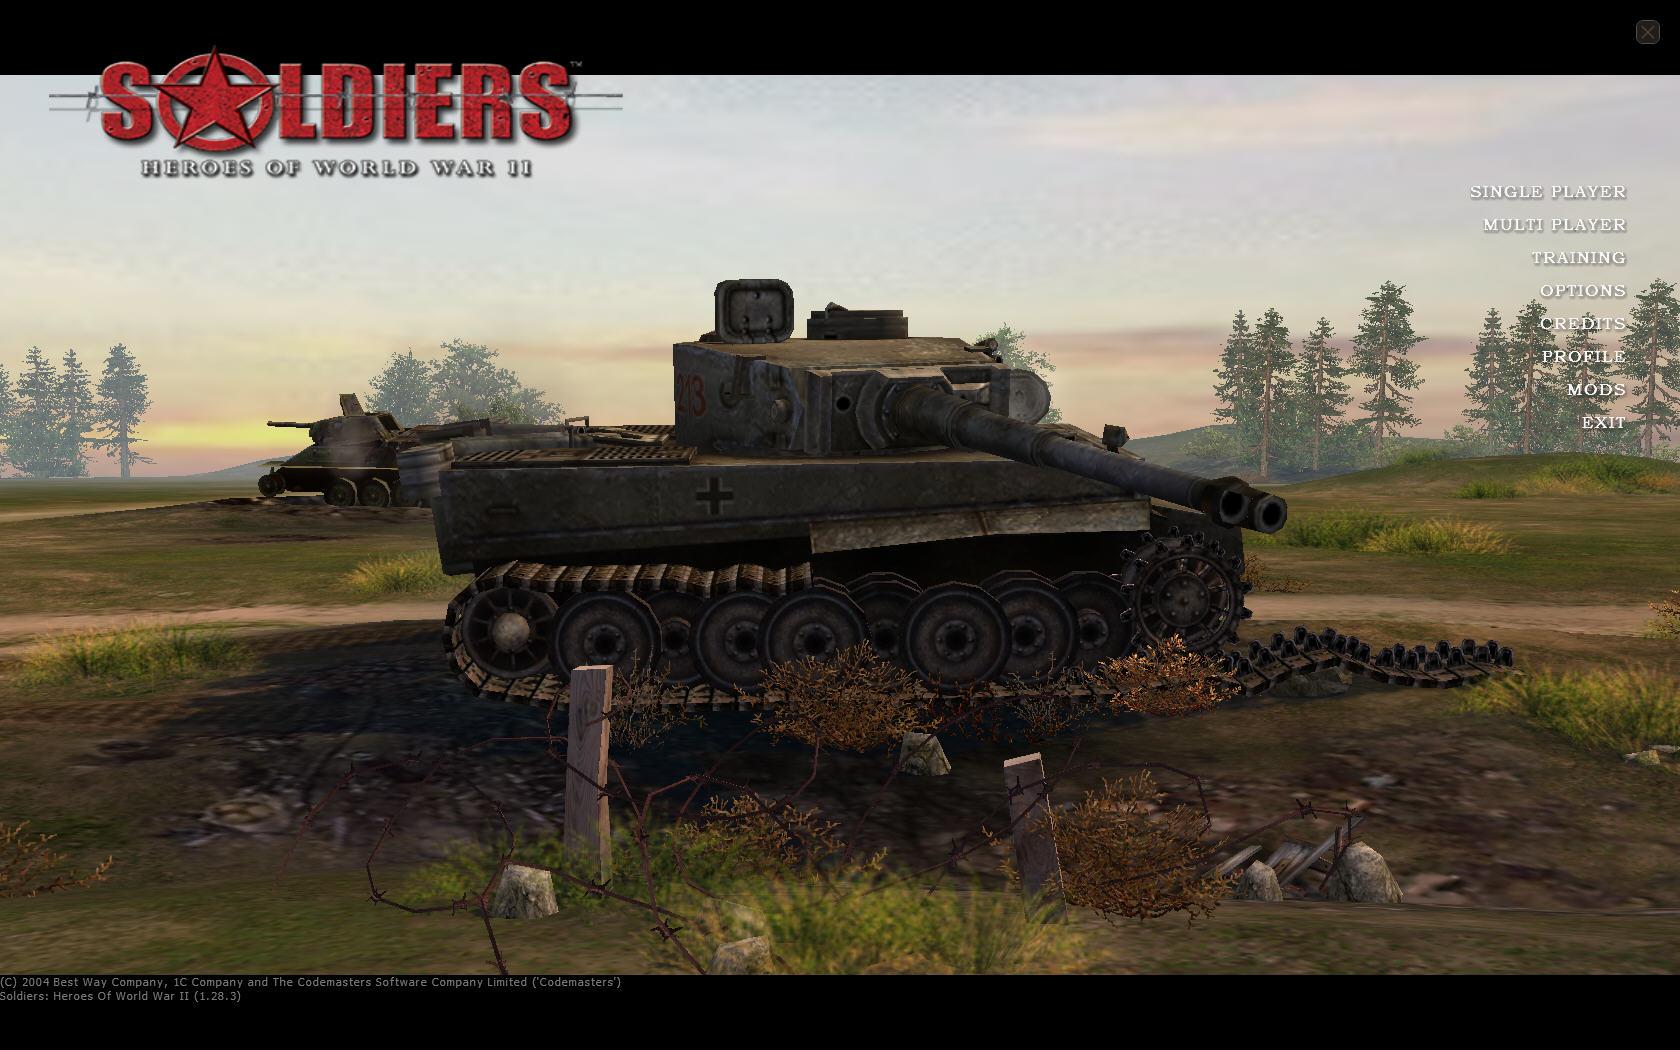 士兵:二战英雄(Soldiers:Heroes of World War 2)硬盘版截图1